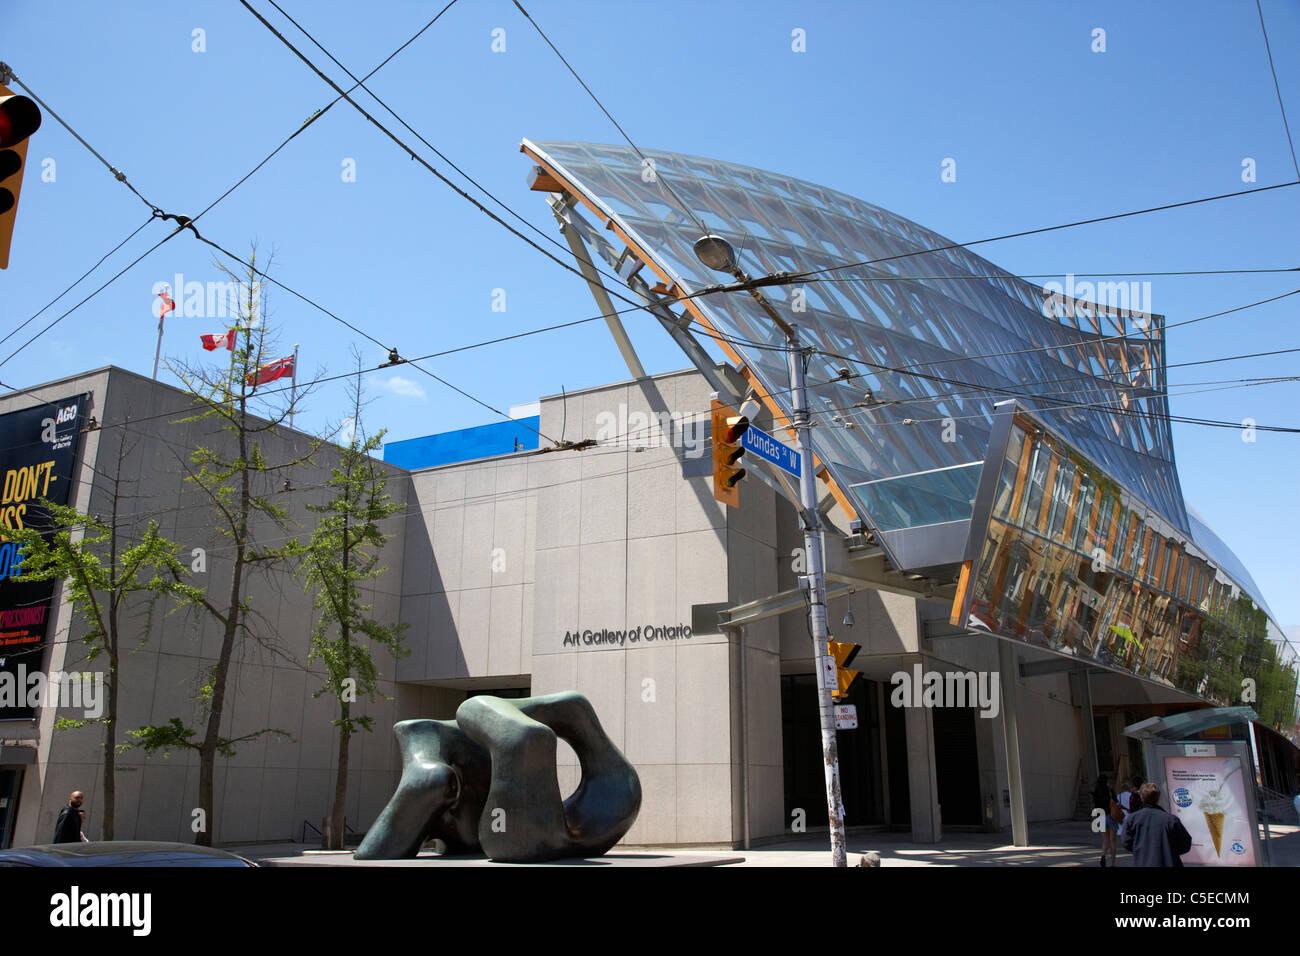 ago the art gallery of ontario with frank gehry facade in toronto ontario canada - Stock Image